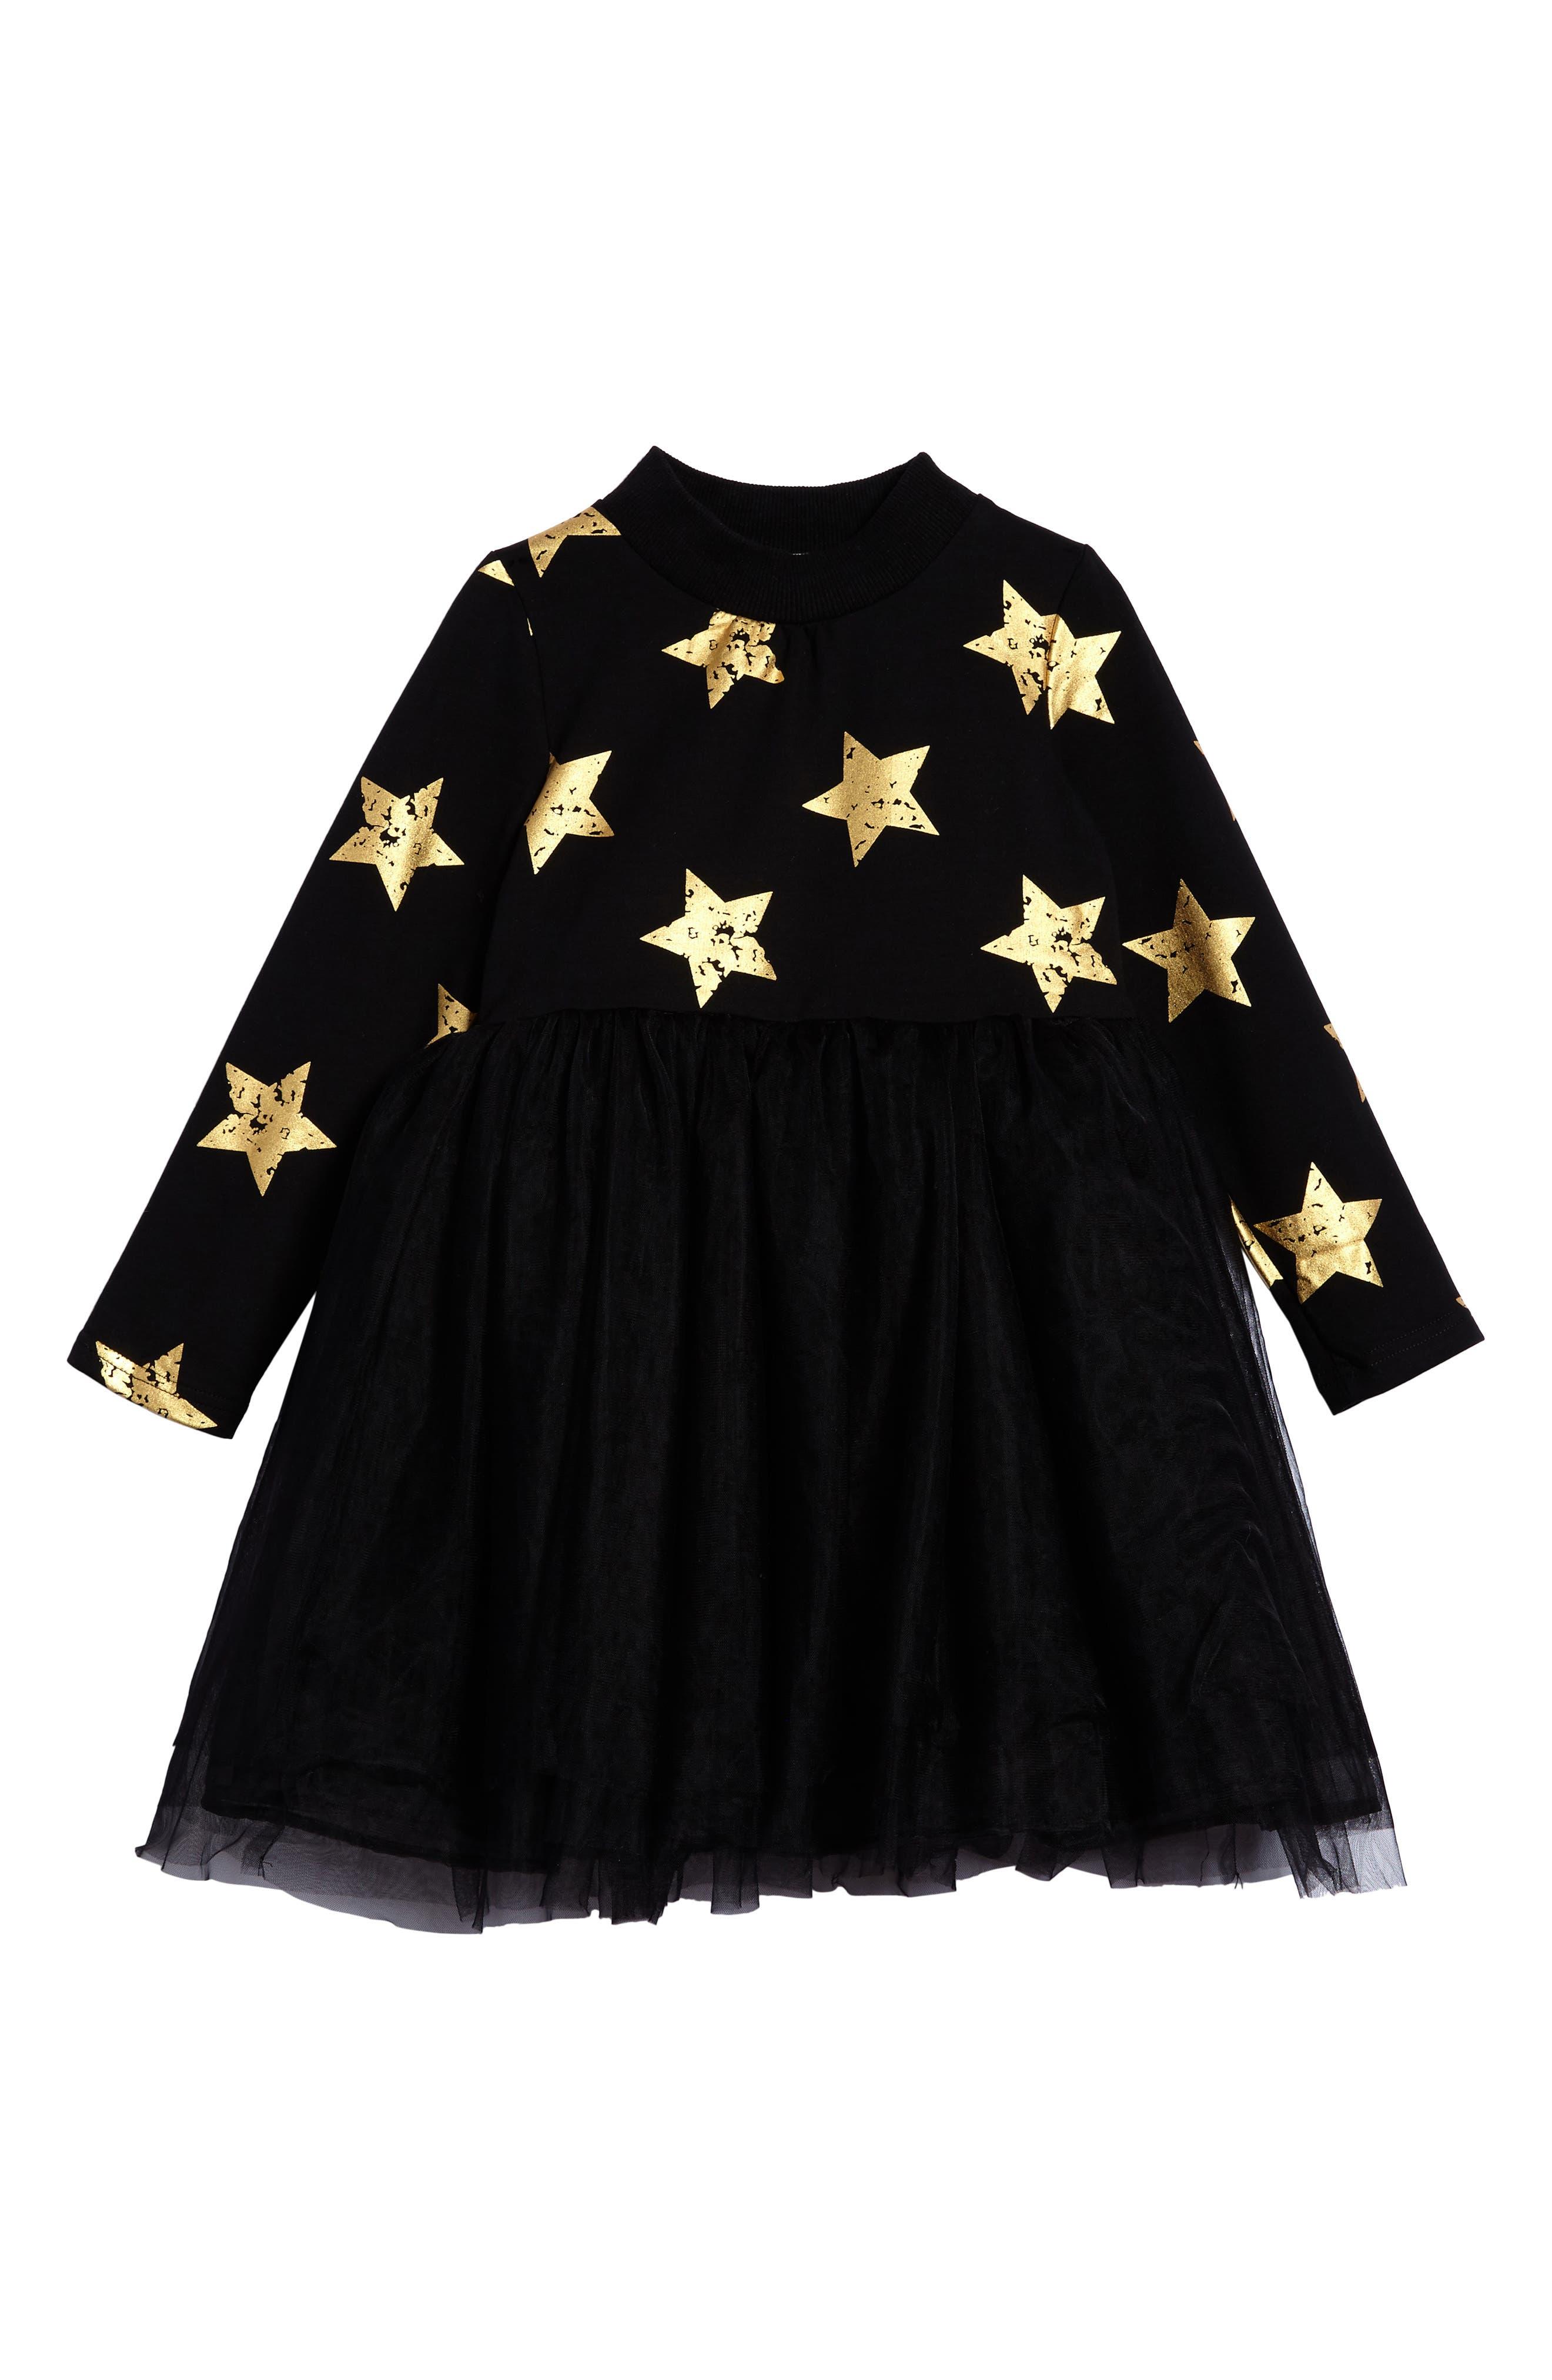 Main Image - Doe A Dear Star Tulle Party Dress (Toddler Girls, Little Girls & Big Girls)